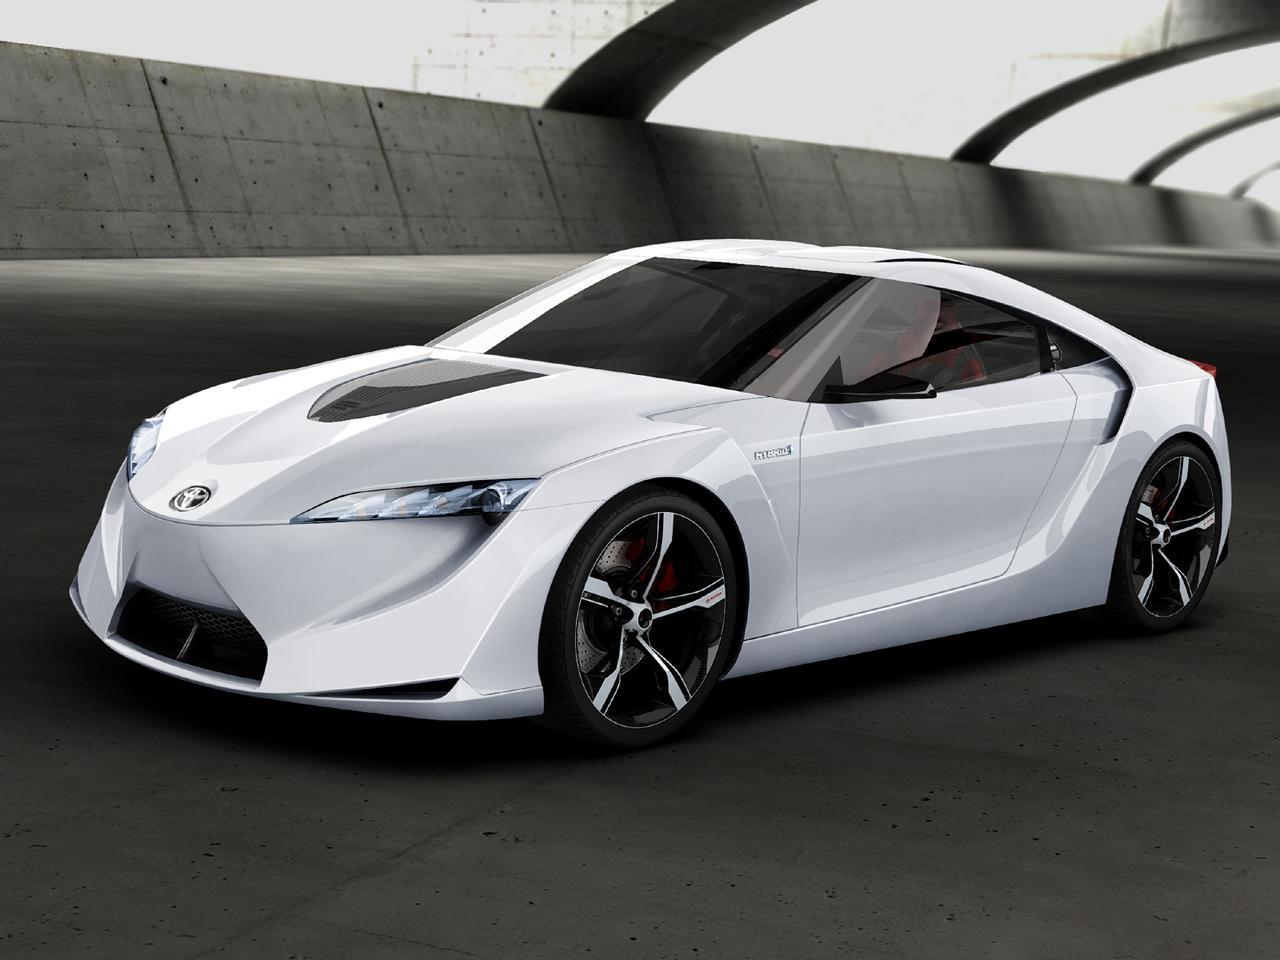 toyota supra concept destined for 2014 detroit auto show digital trends. Black Bedroom Furniture Sets. Home Design Ideas